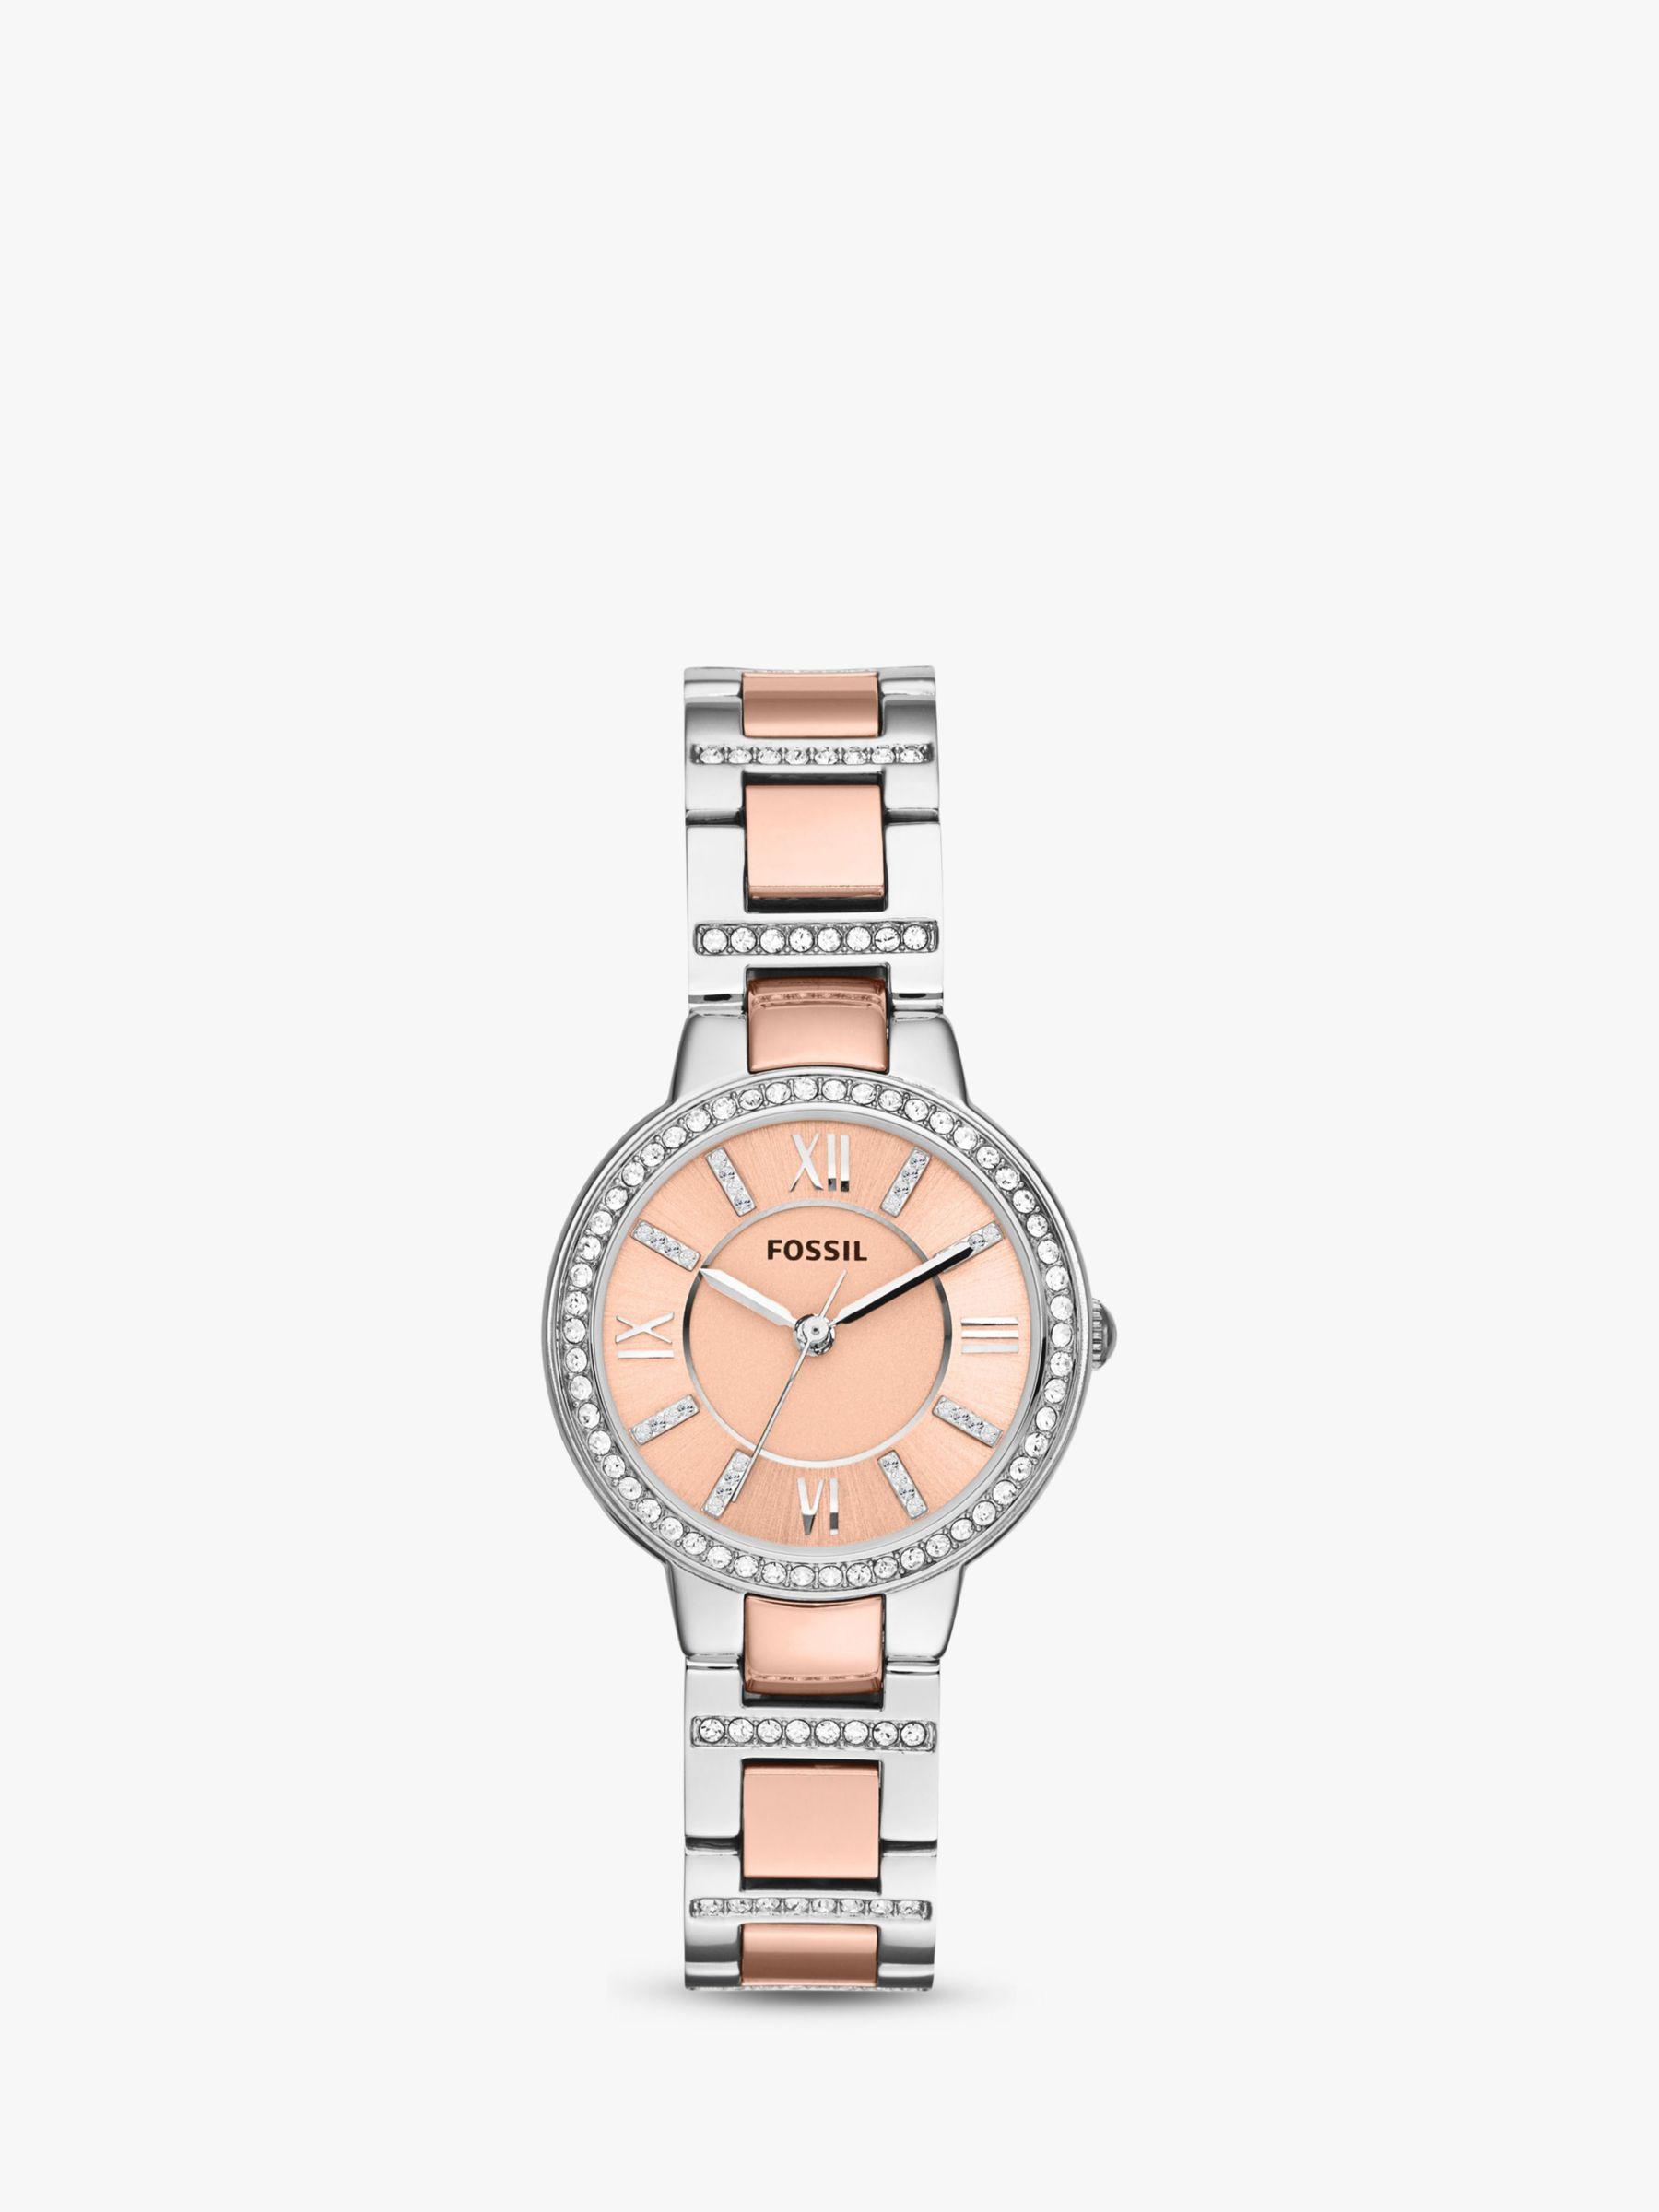 Fossil Fossil Women's Virginia Two Tone Stainless Steel Bracelet Strap Watch